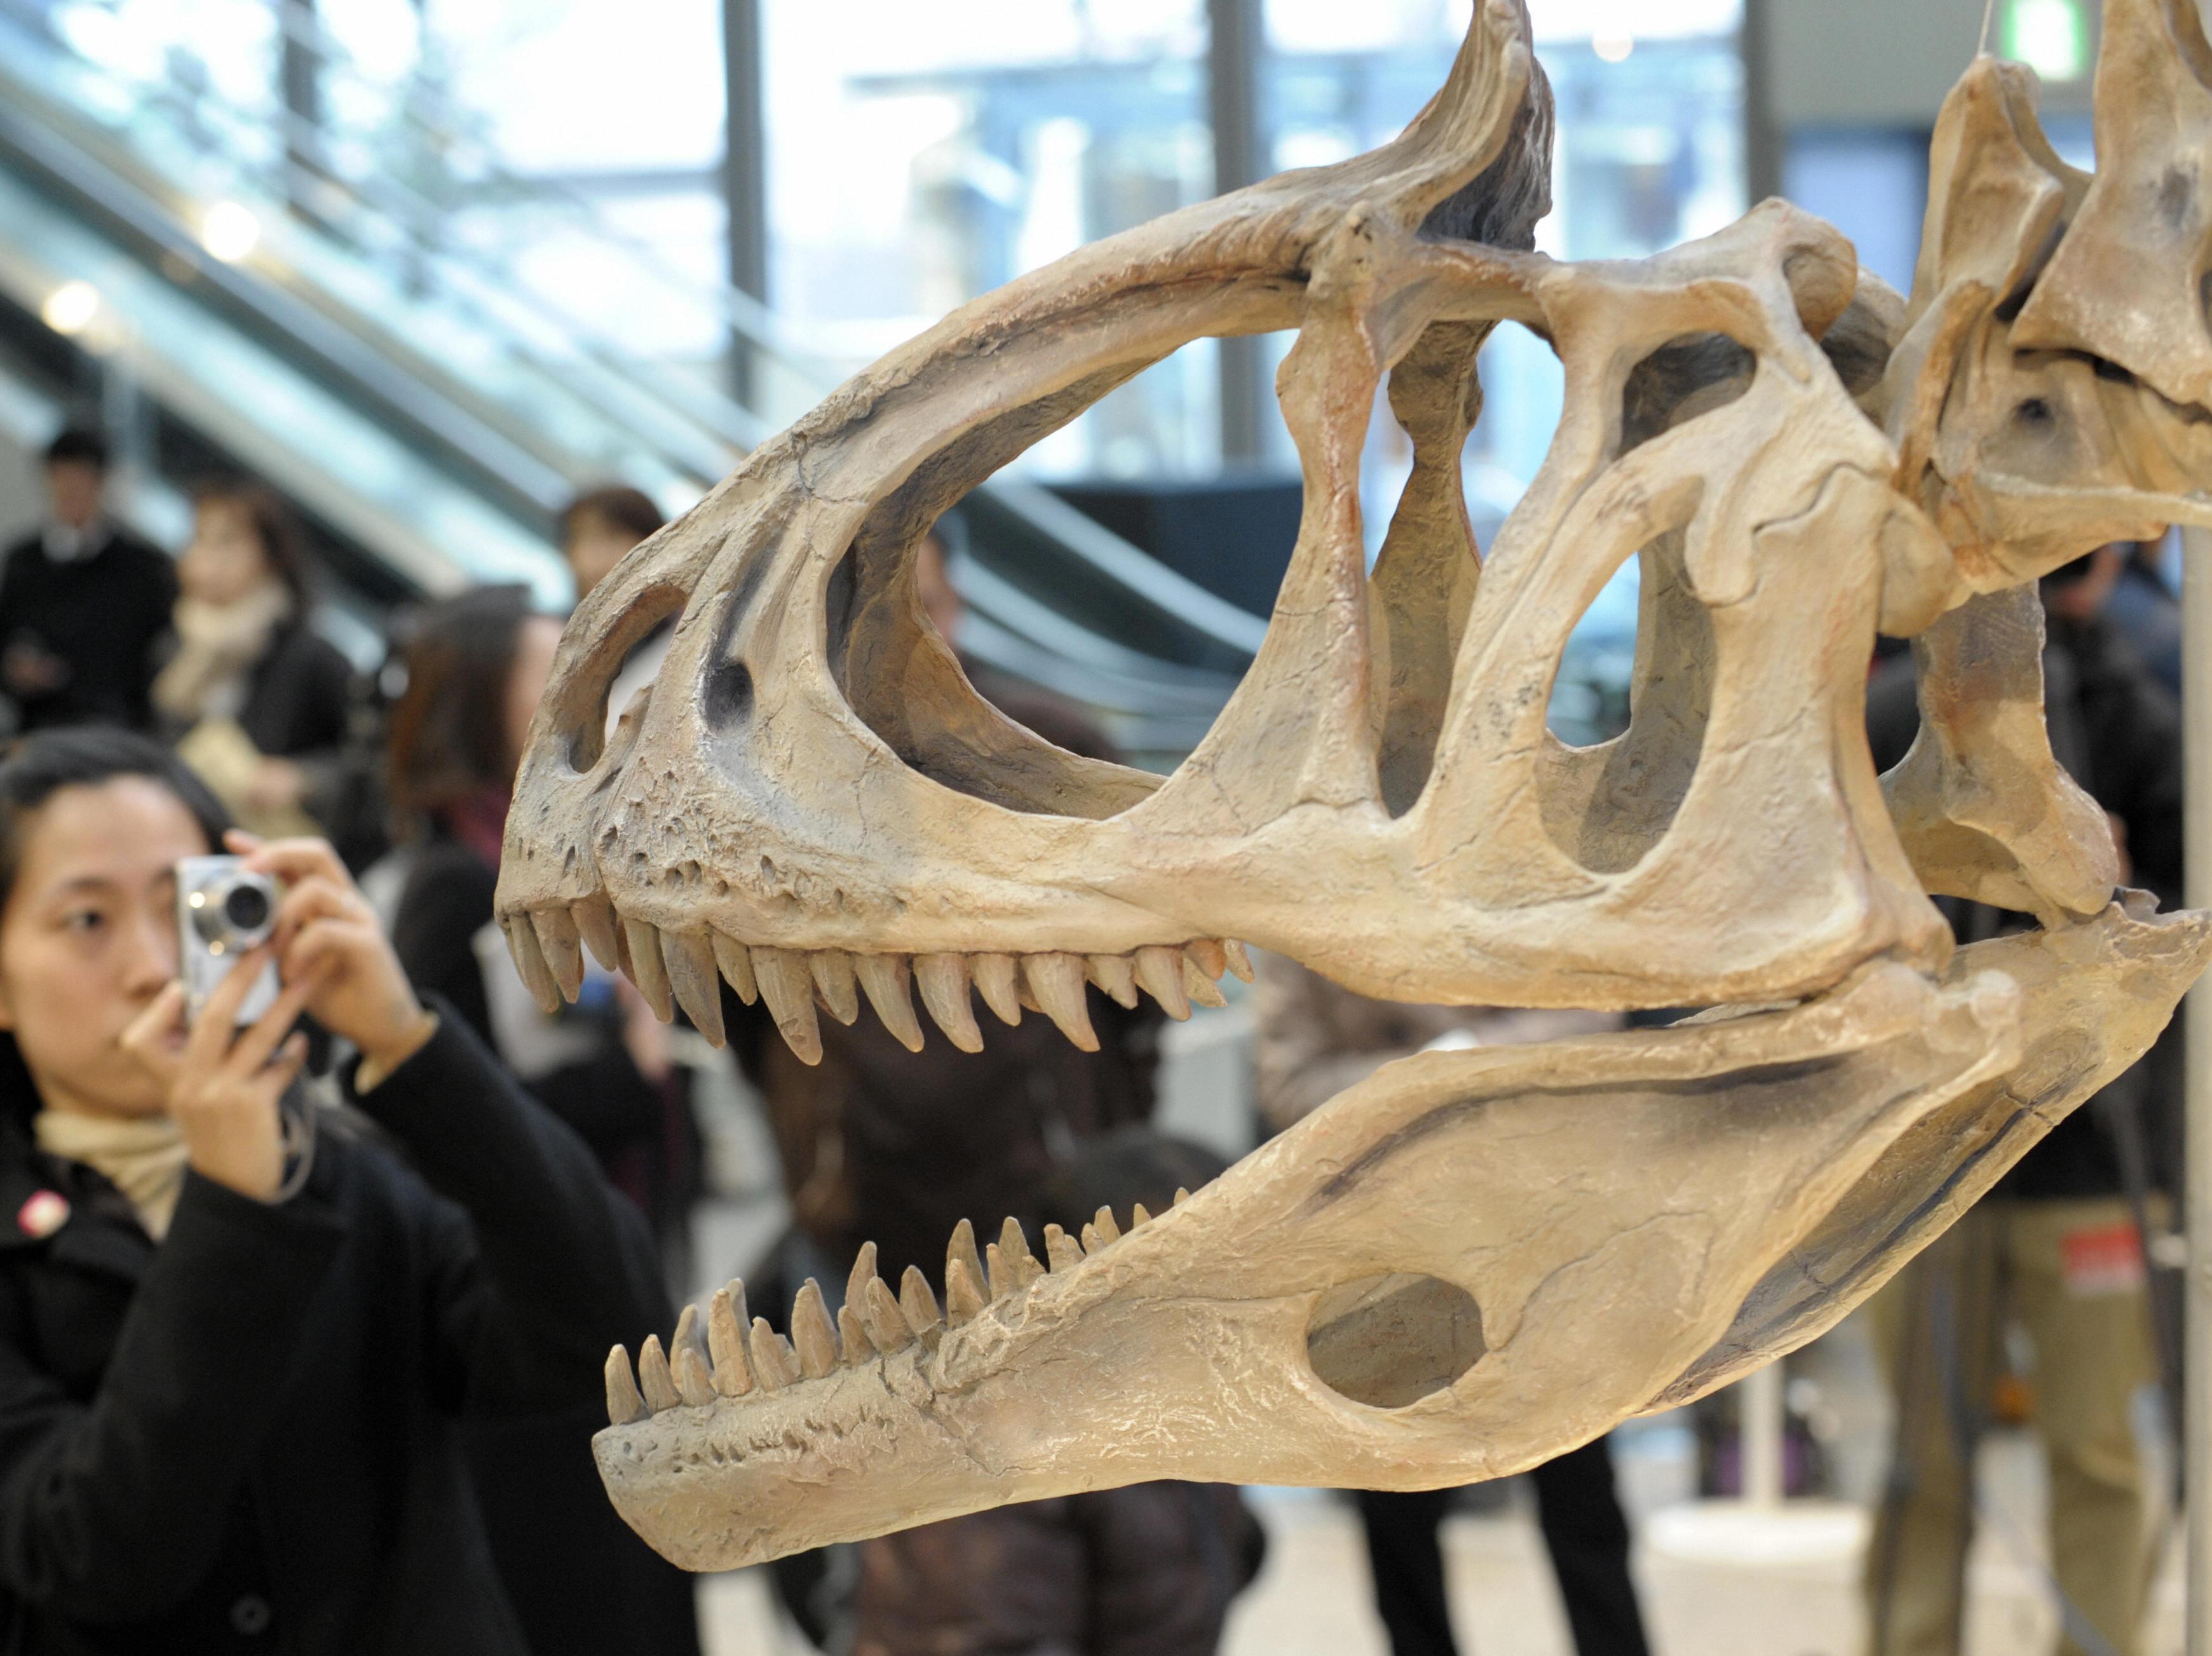 Waren Dinosaurier Warm- oder Kaltblüter?